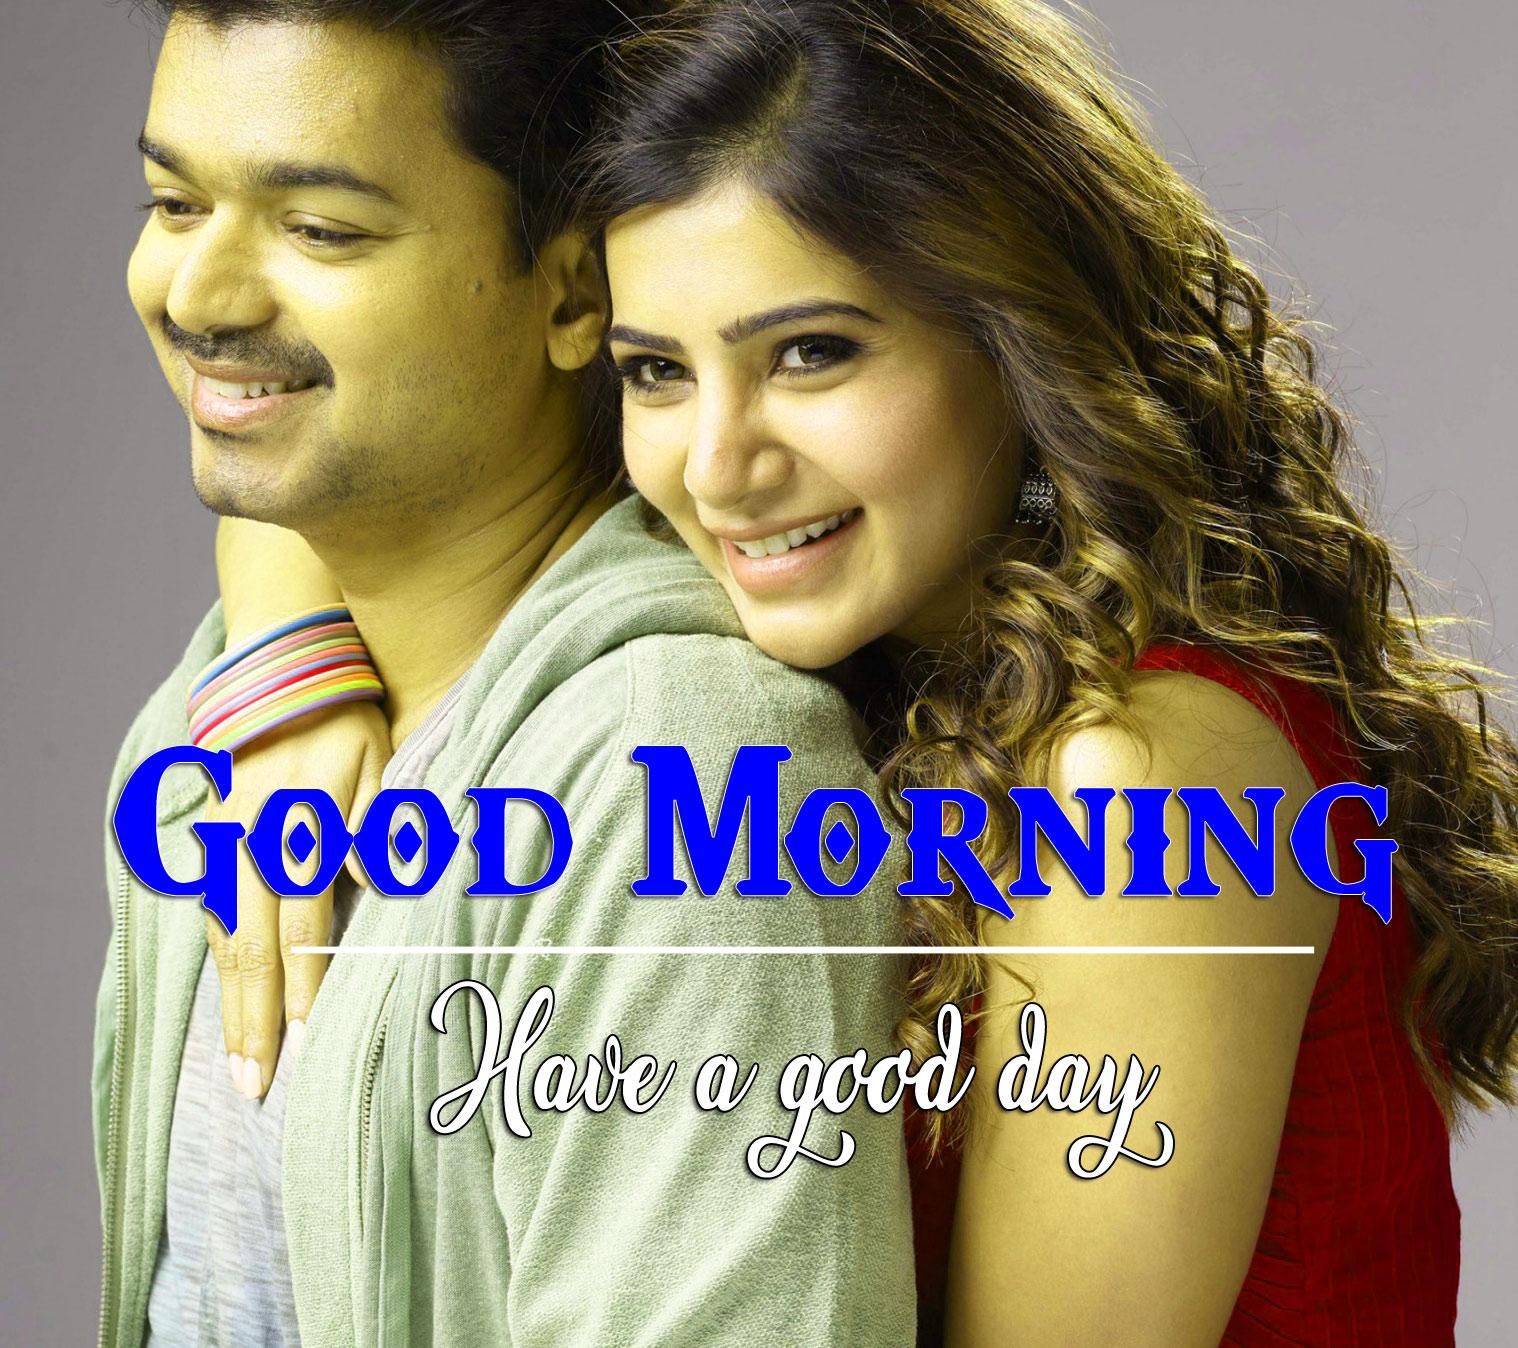 Free HD Good Morning Wishes Pics Wallpaper